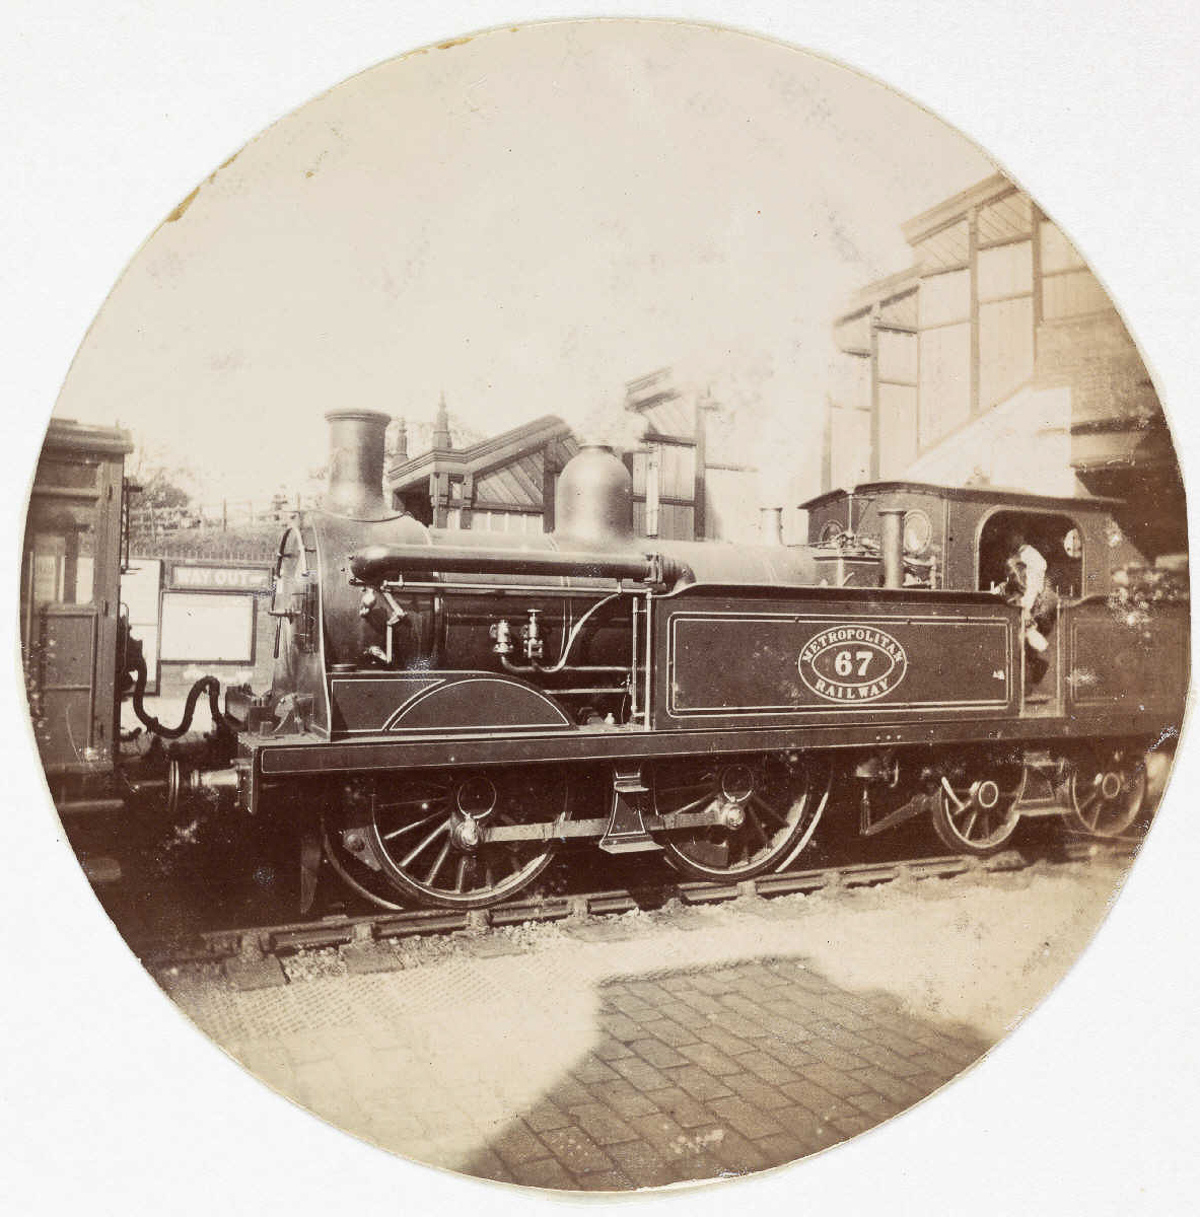 pervye snimki s fotokamery Kodak 12